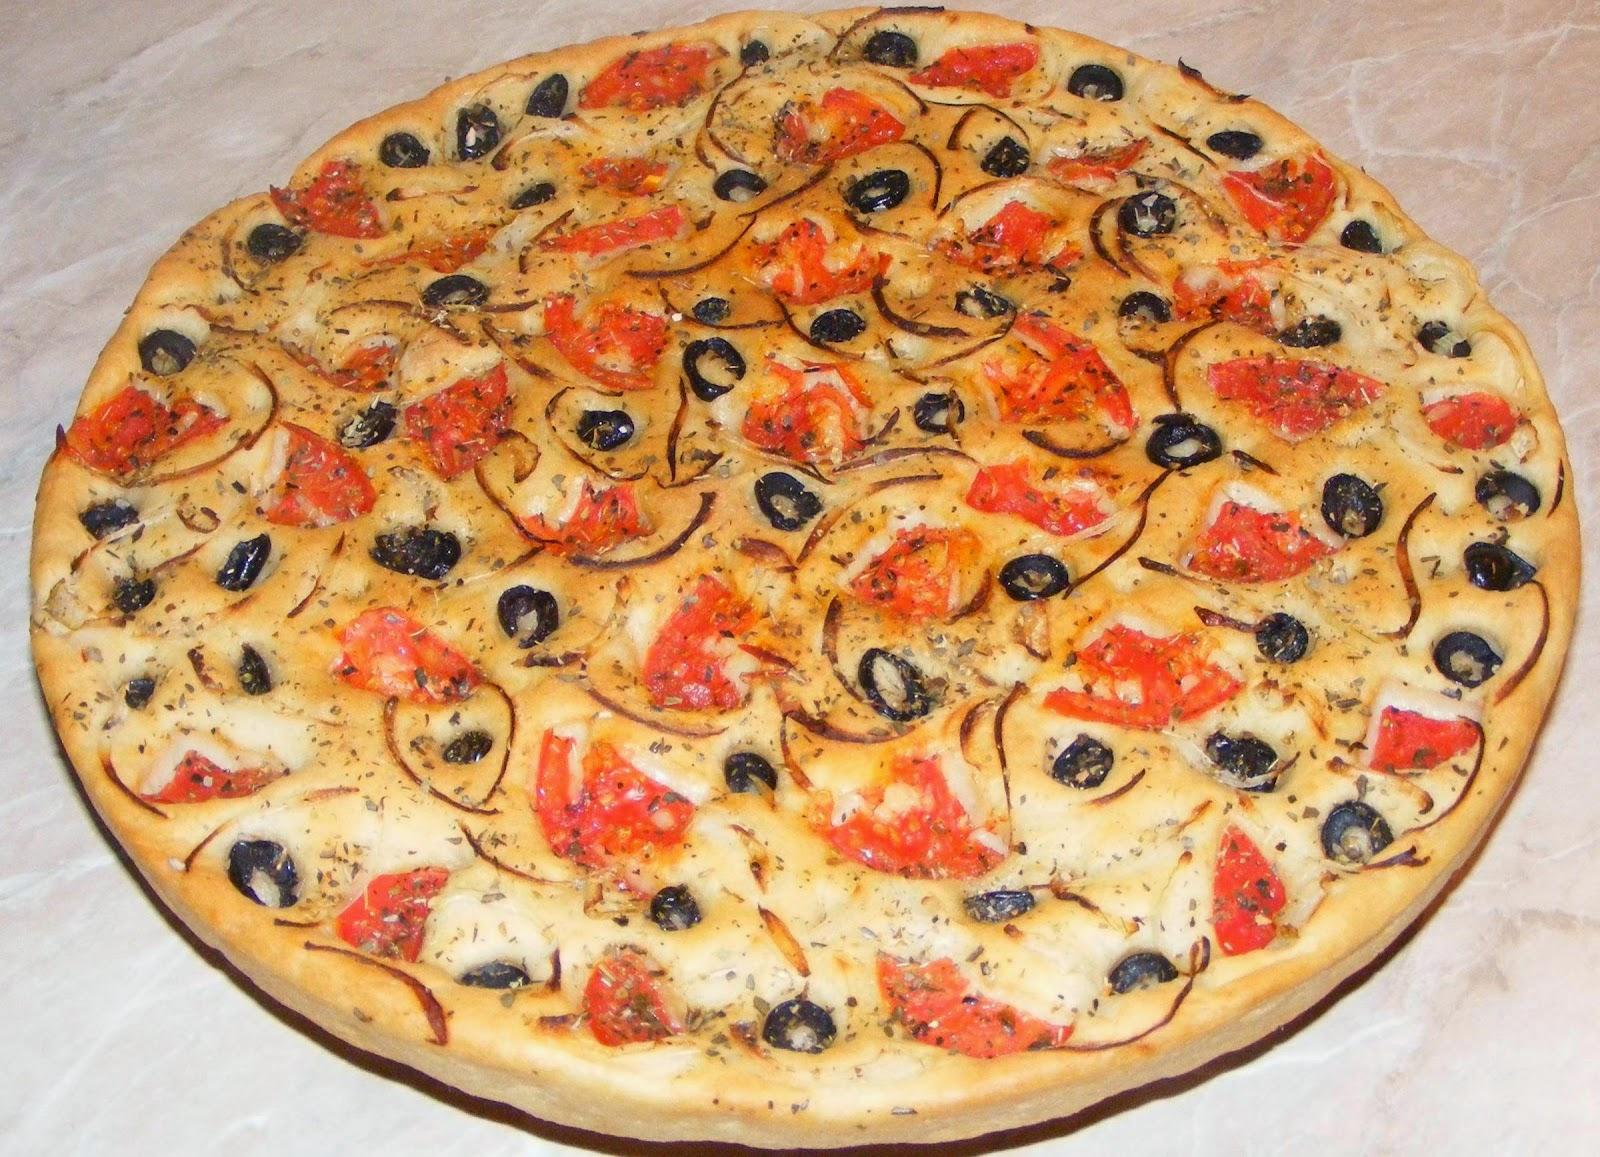 focaccia, focaccia italiana, focaccia de post, reteta focaccia, pizza, pizza italiana, paine, blat pizza, retete de post, retete culinare, retete de mancare, focaccia cu ceapa rosii masline si oregano, focaccia de casa,